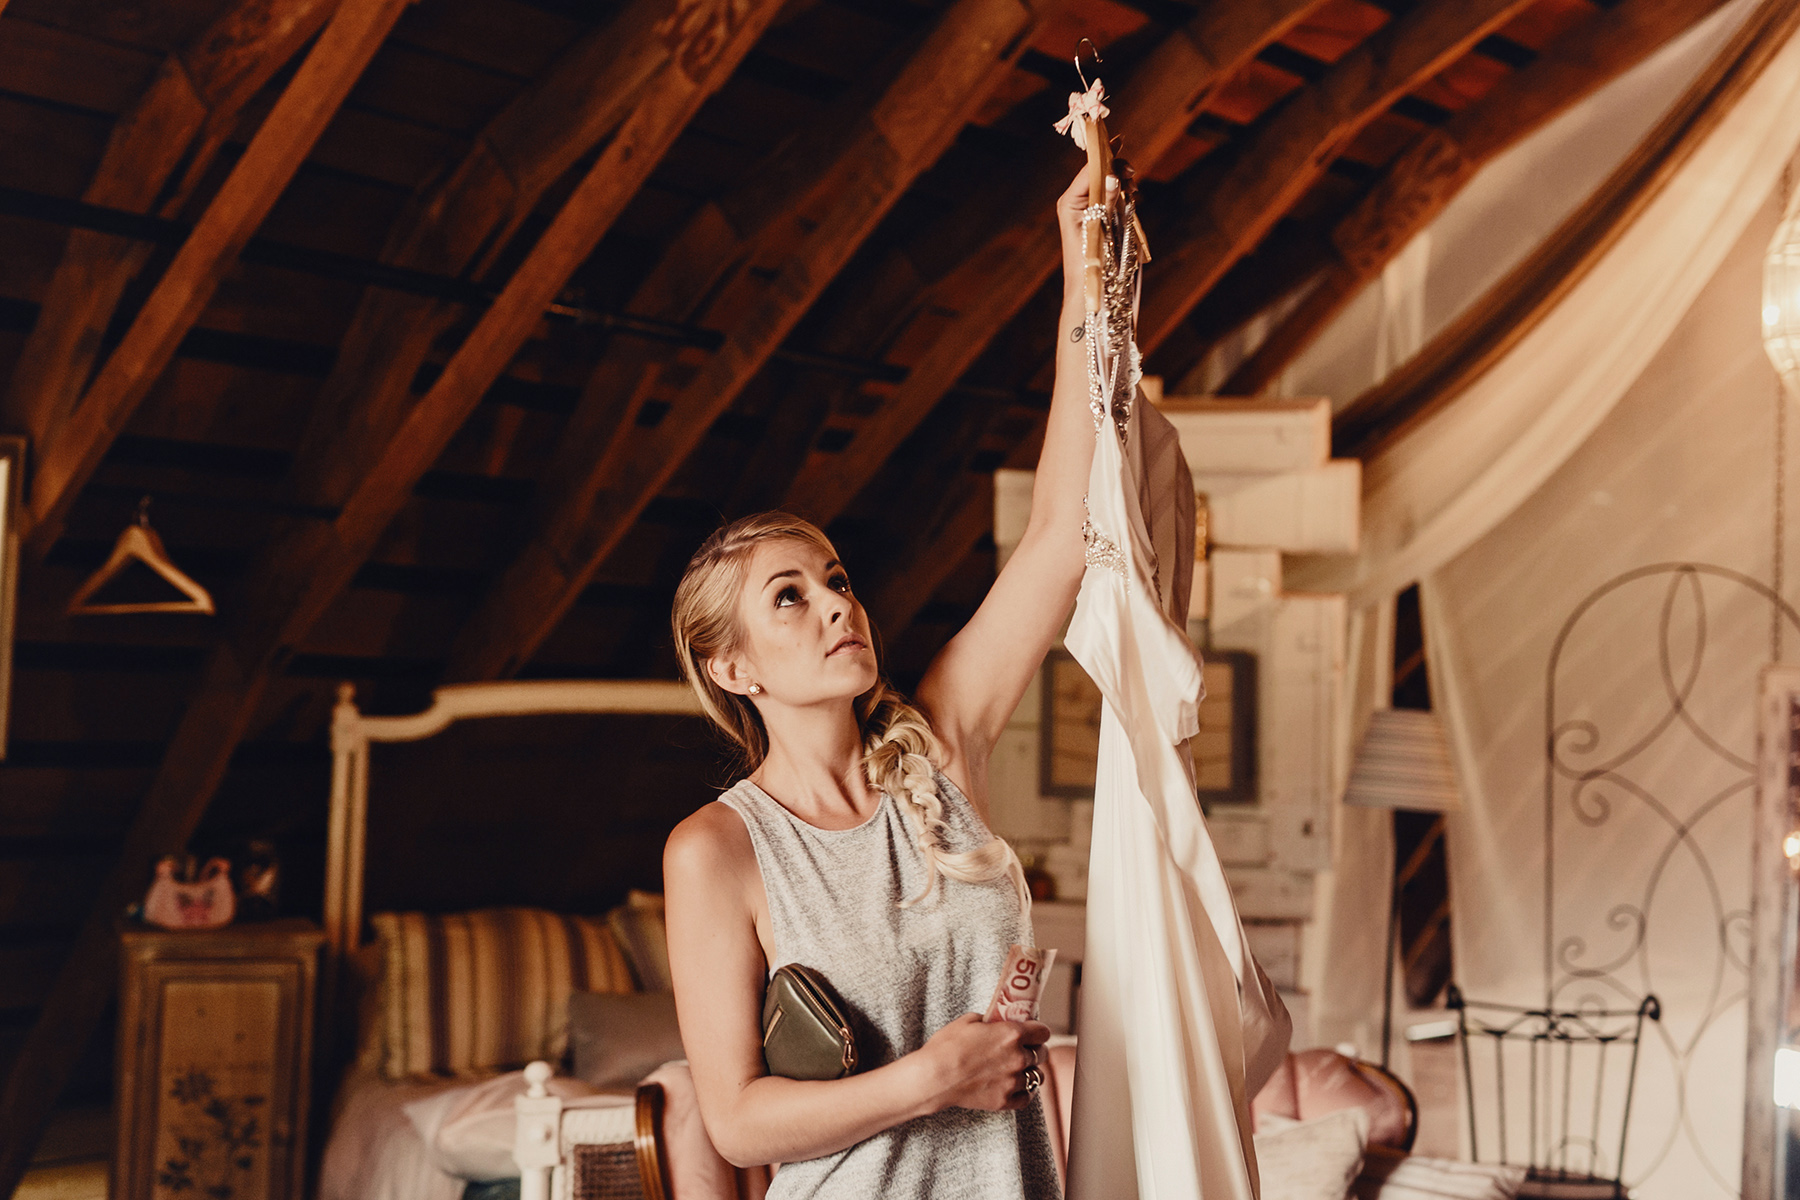 kildara-farms-wedding-photo-inspiration-0015